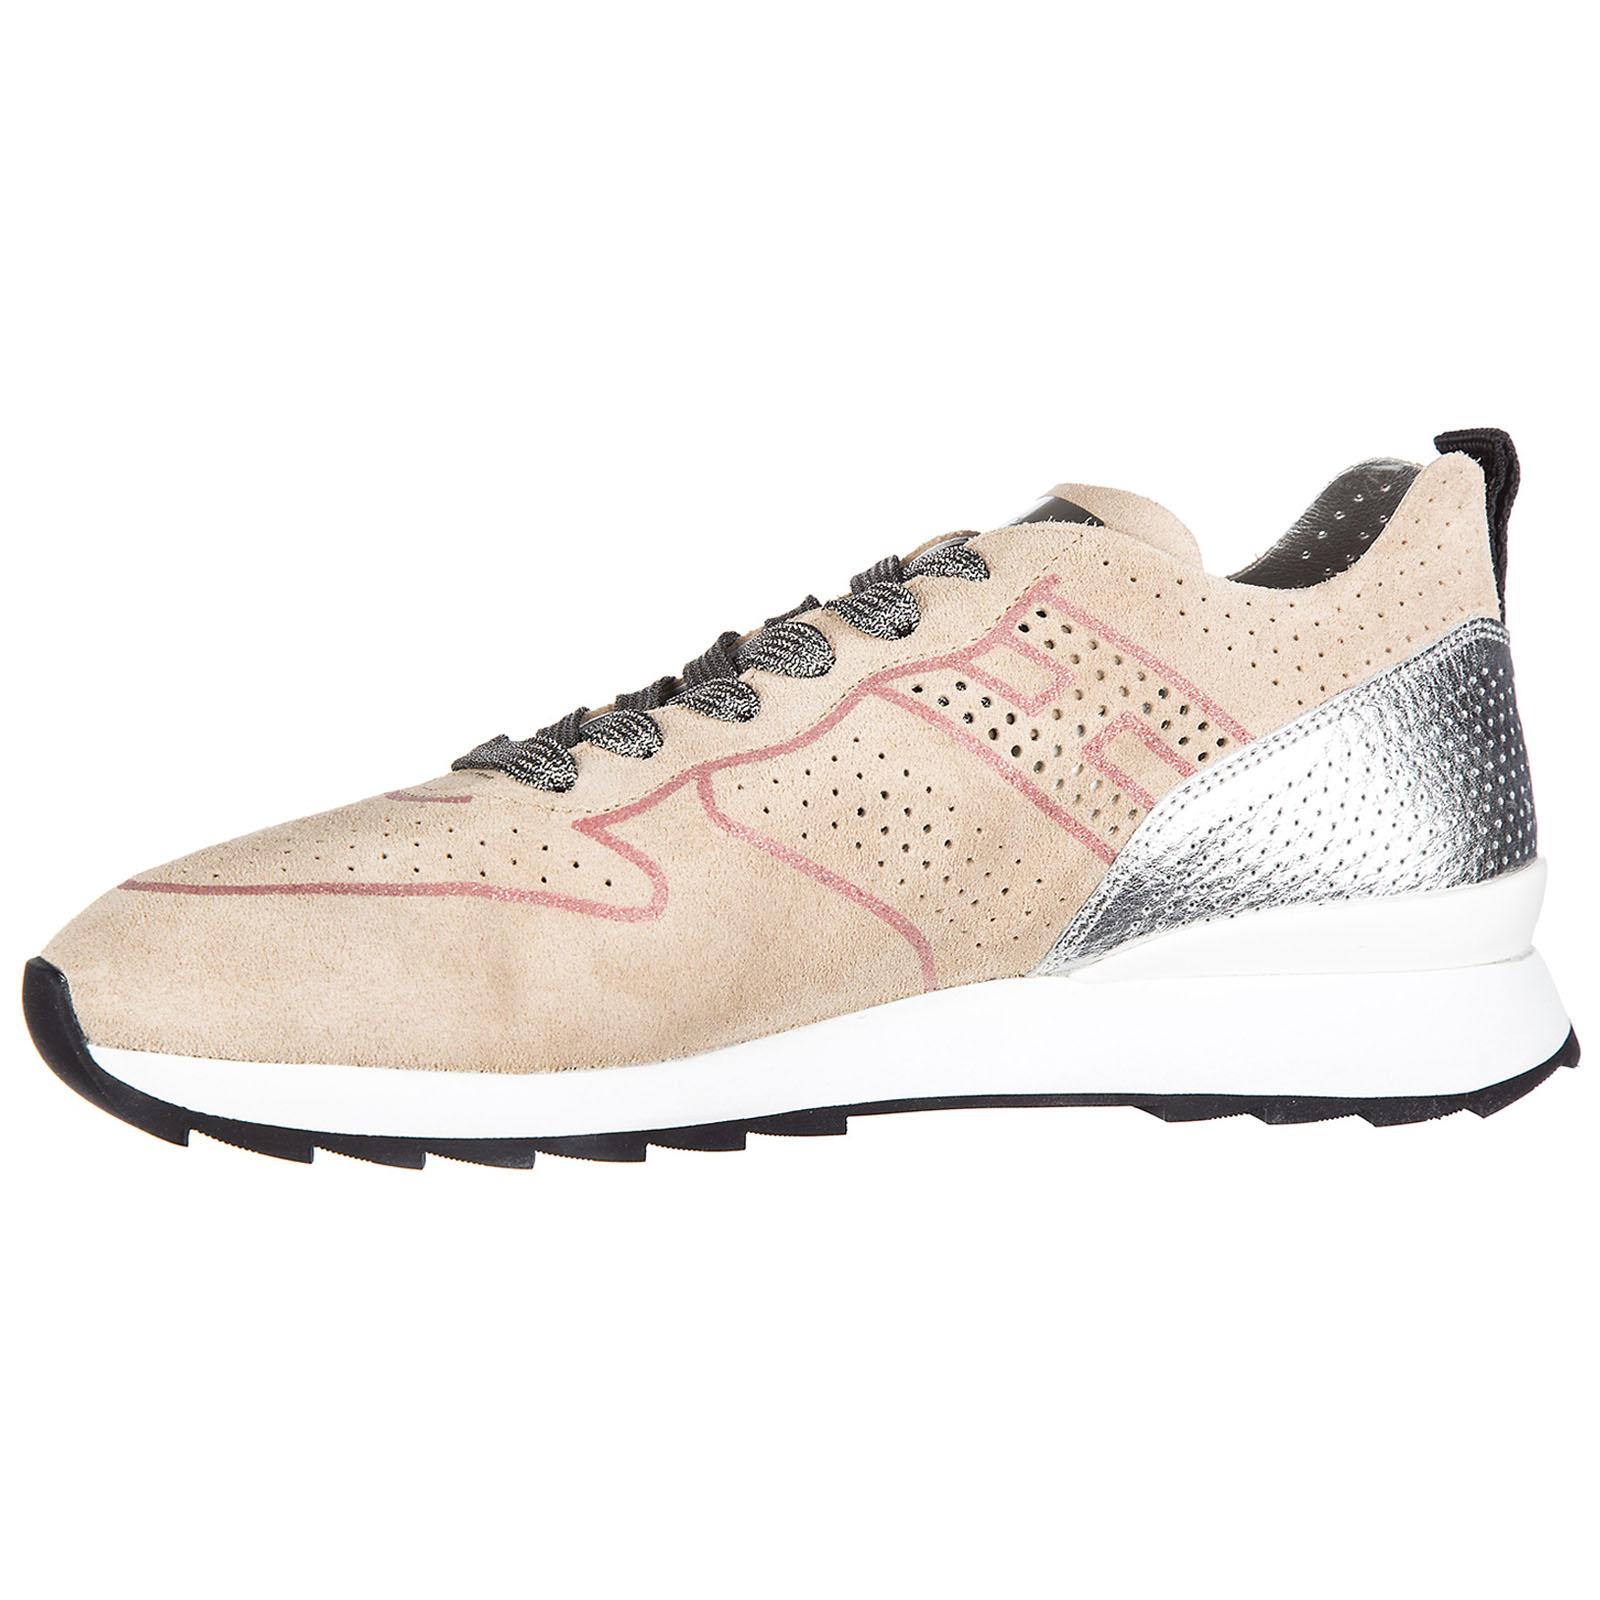 5e24b875674 ... Chaussures baskets sneakers femme en daim r261 ...